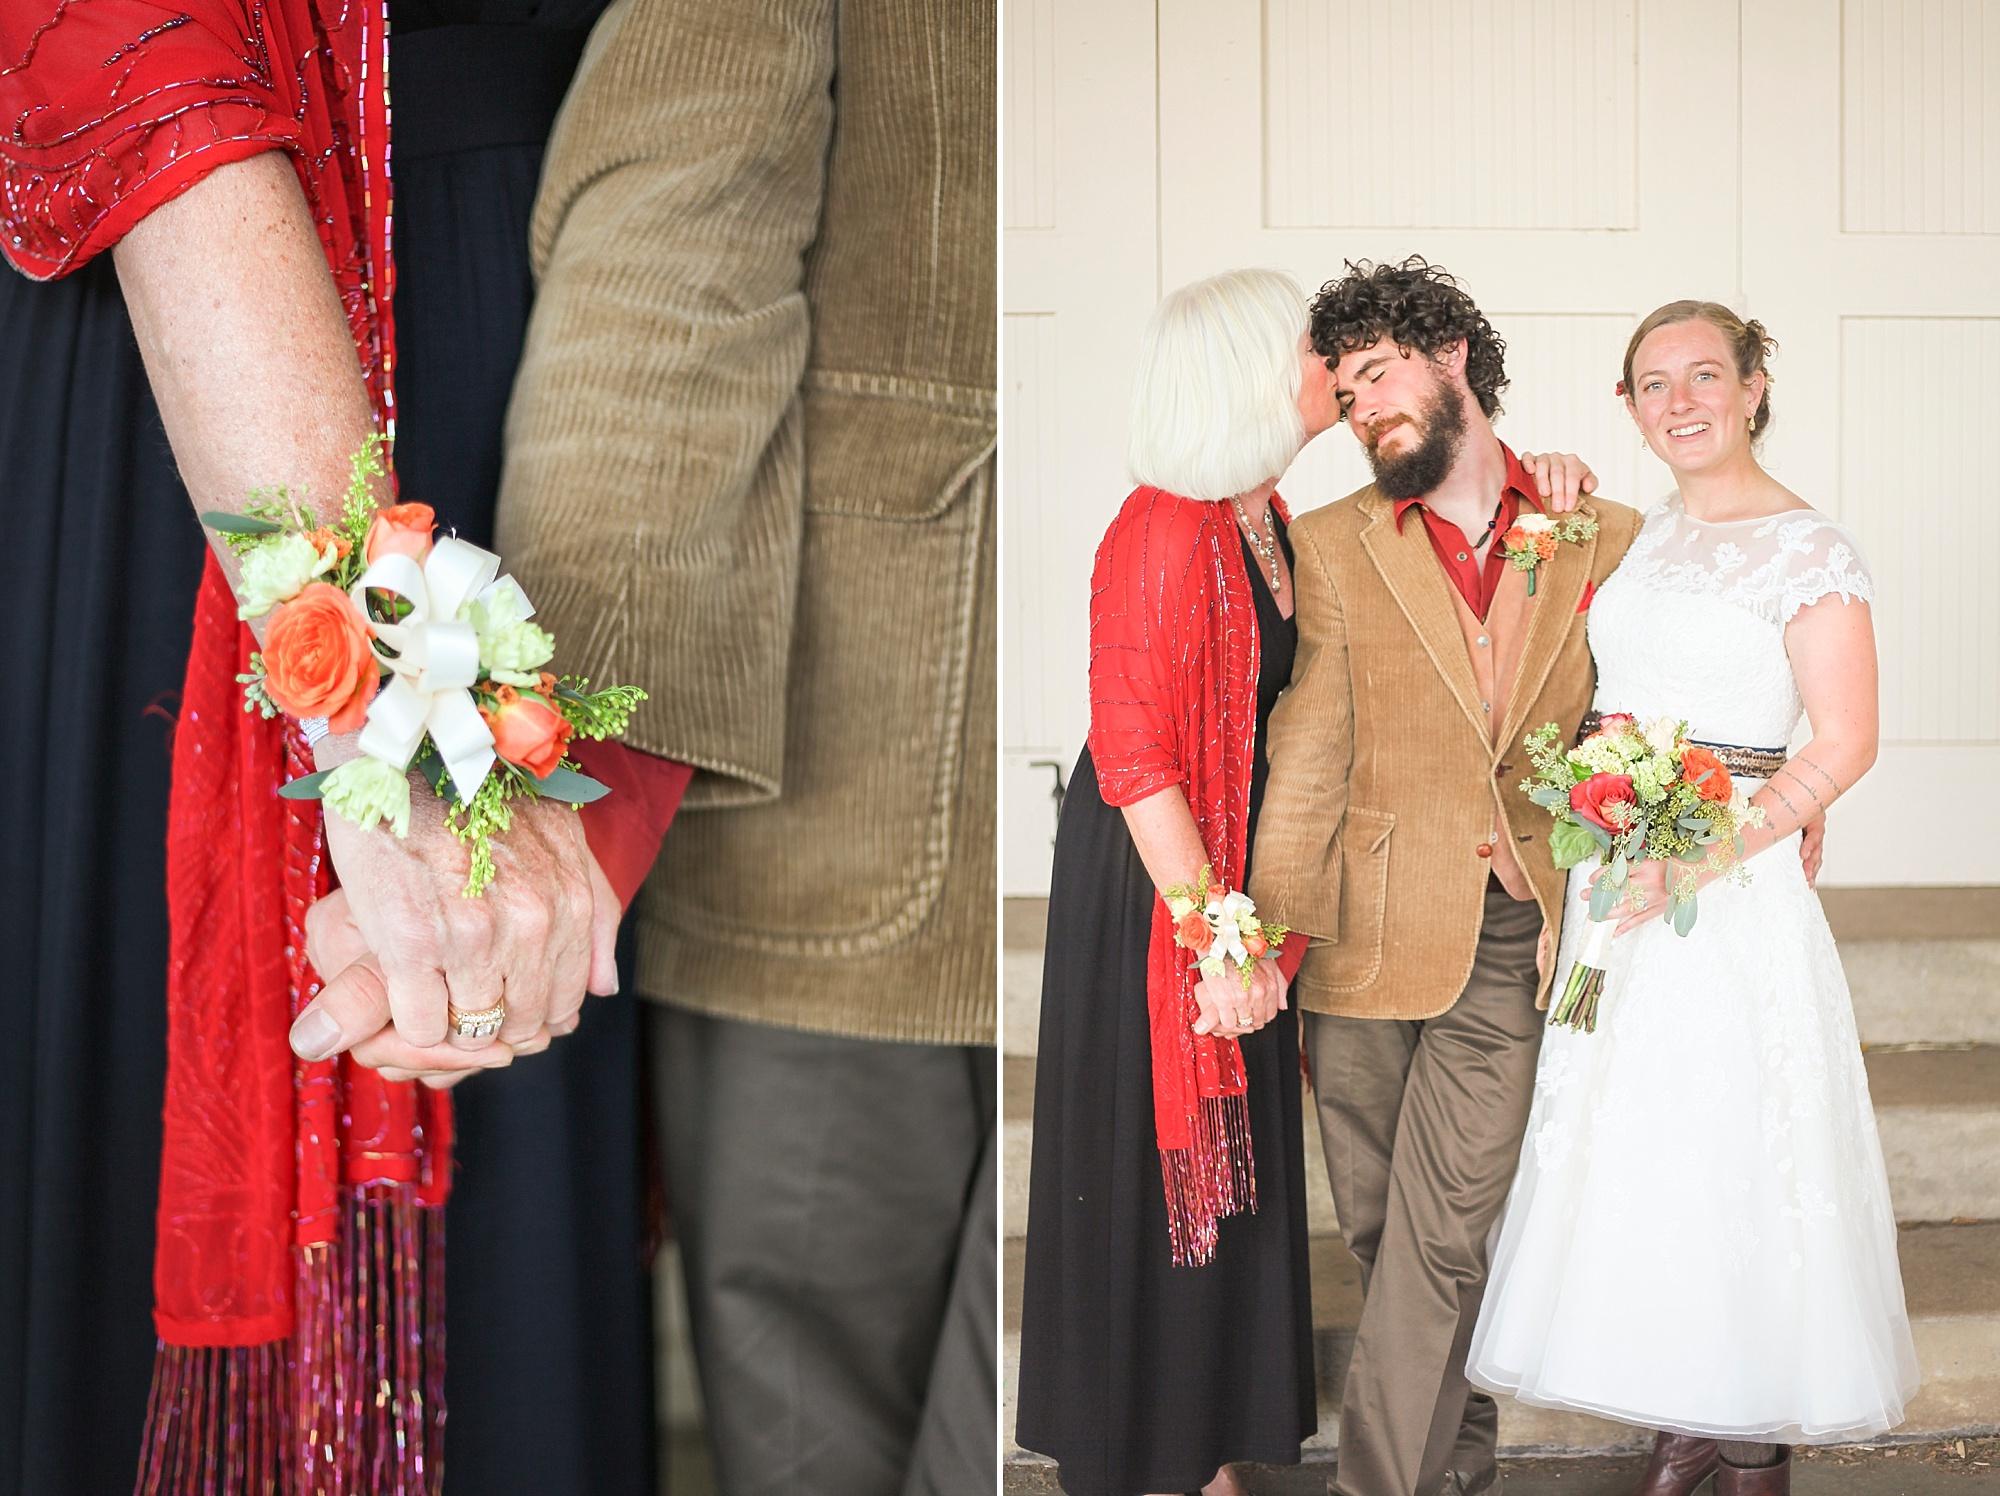 Joe_Mac_Creative_Mollie_and_Greg_Wedding_Photography_0025.jpg